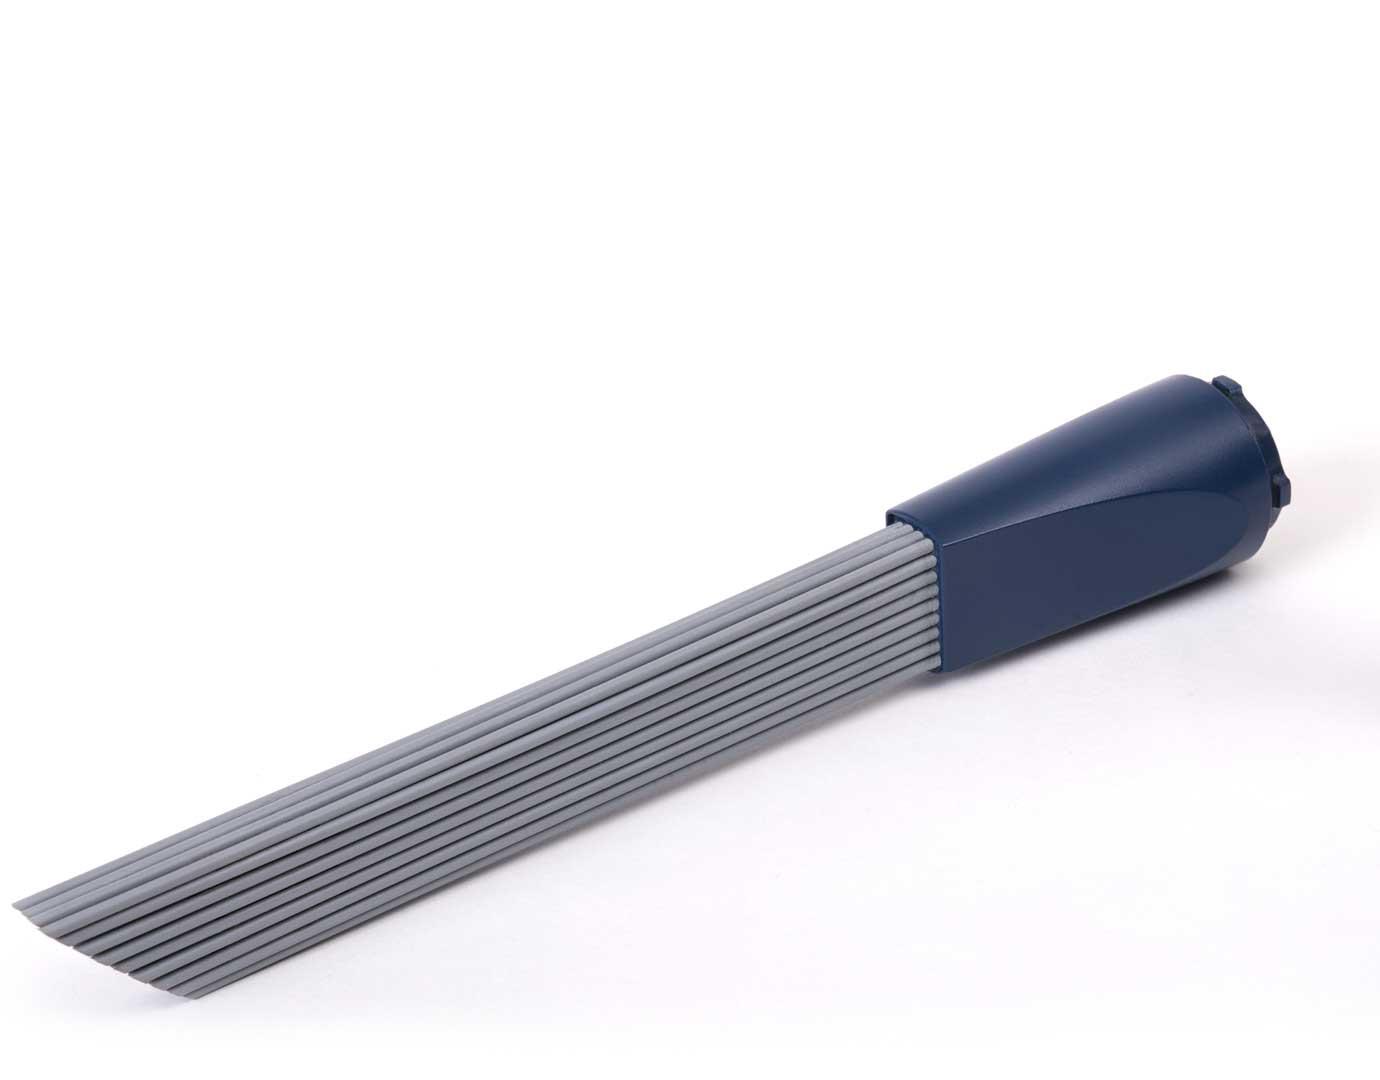 Dusty-Brush Staubsaugeraufsatz Regular - Düse 2,3mm Bild 1